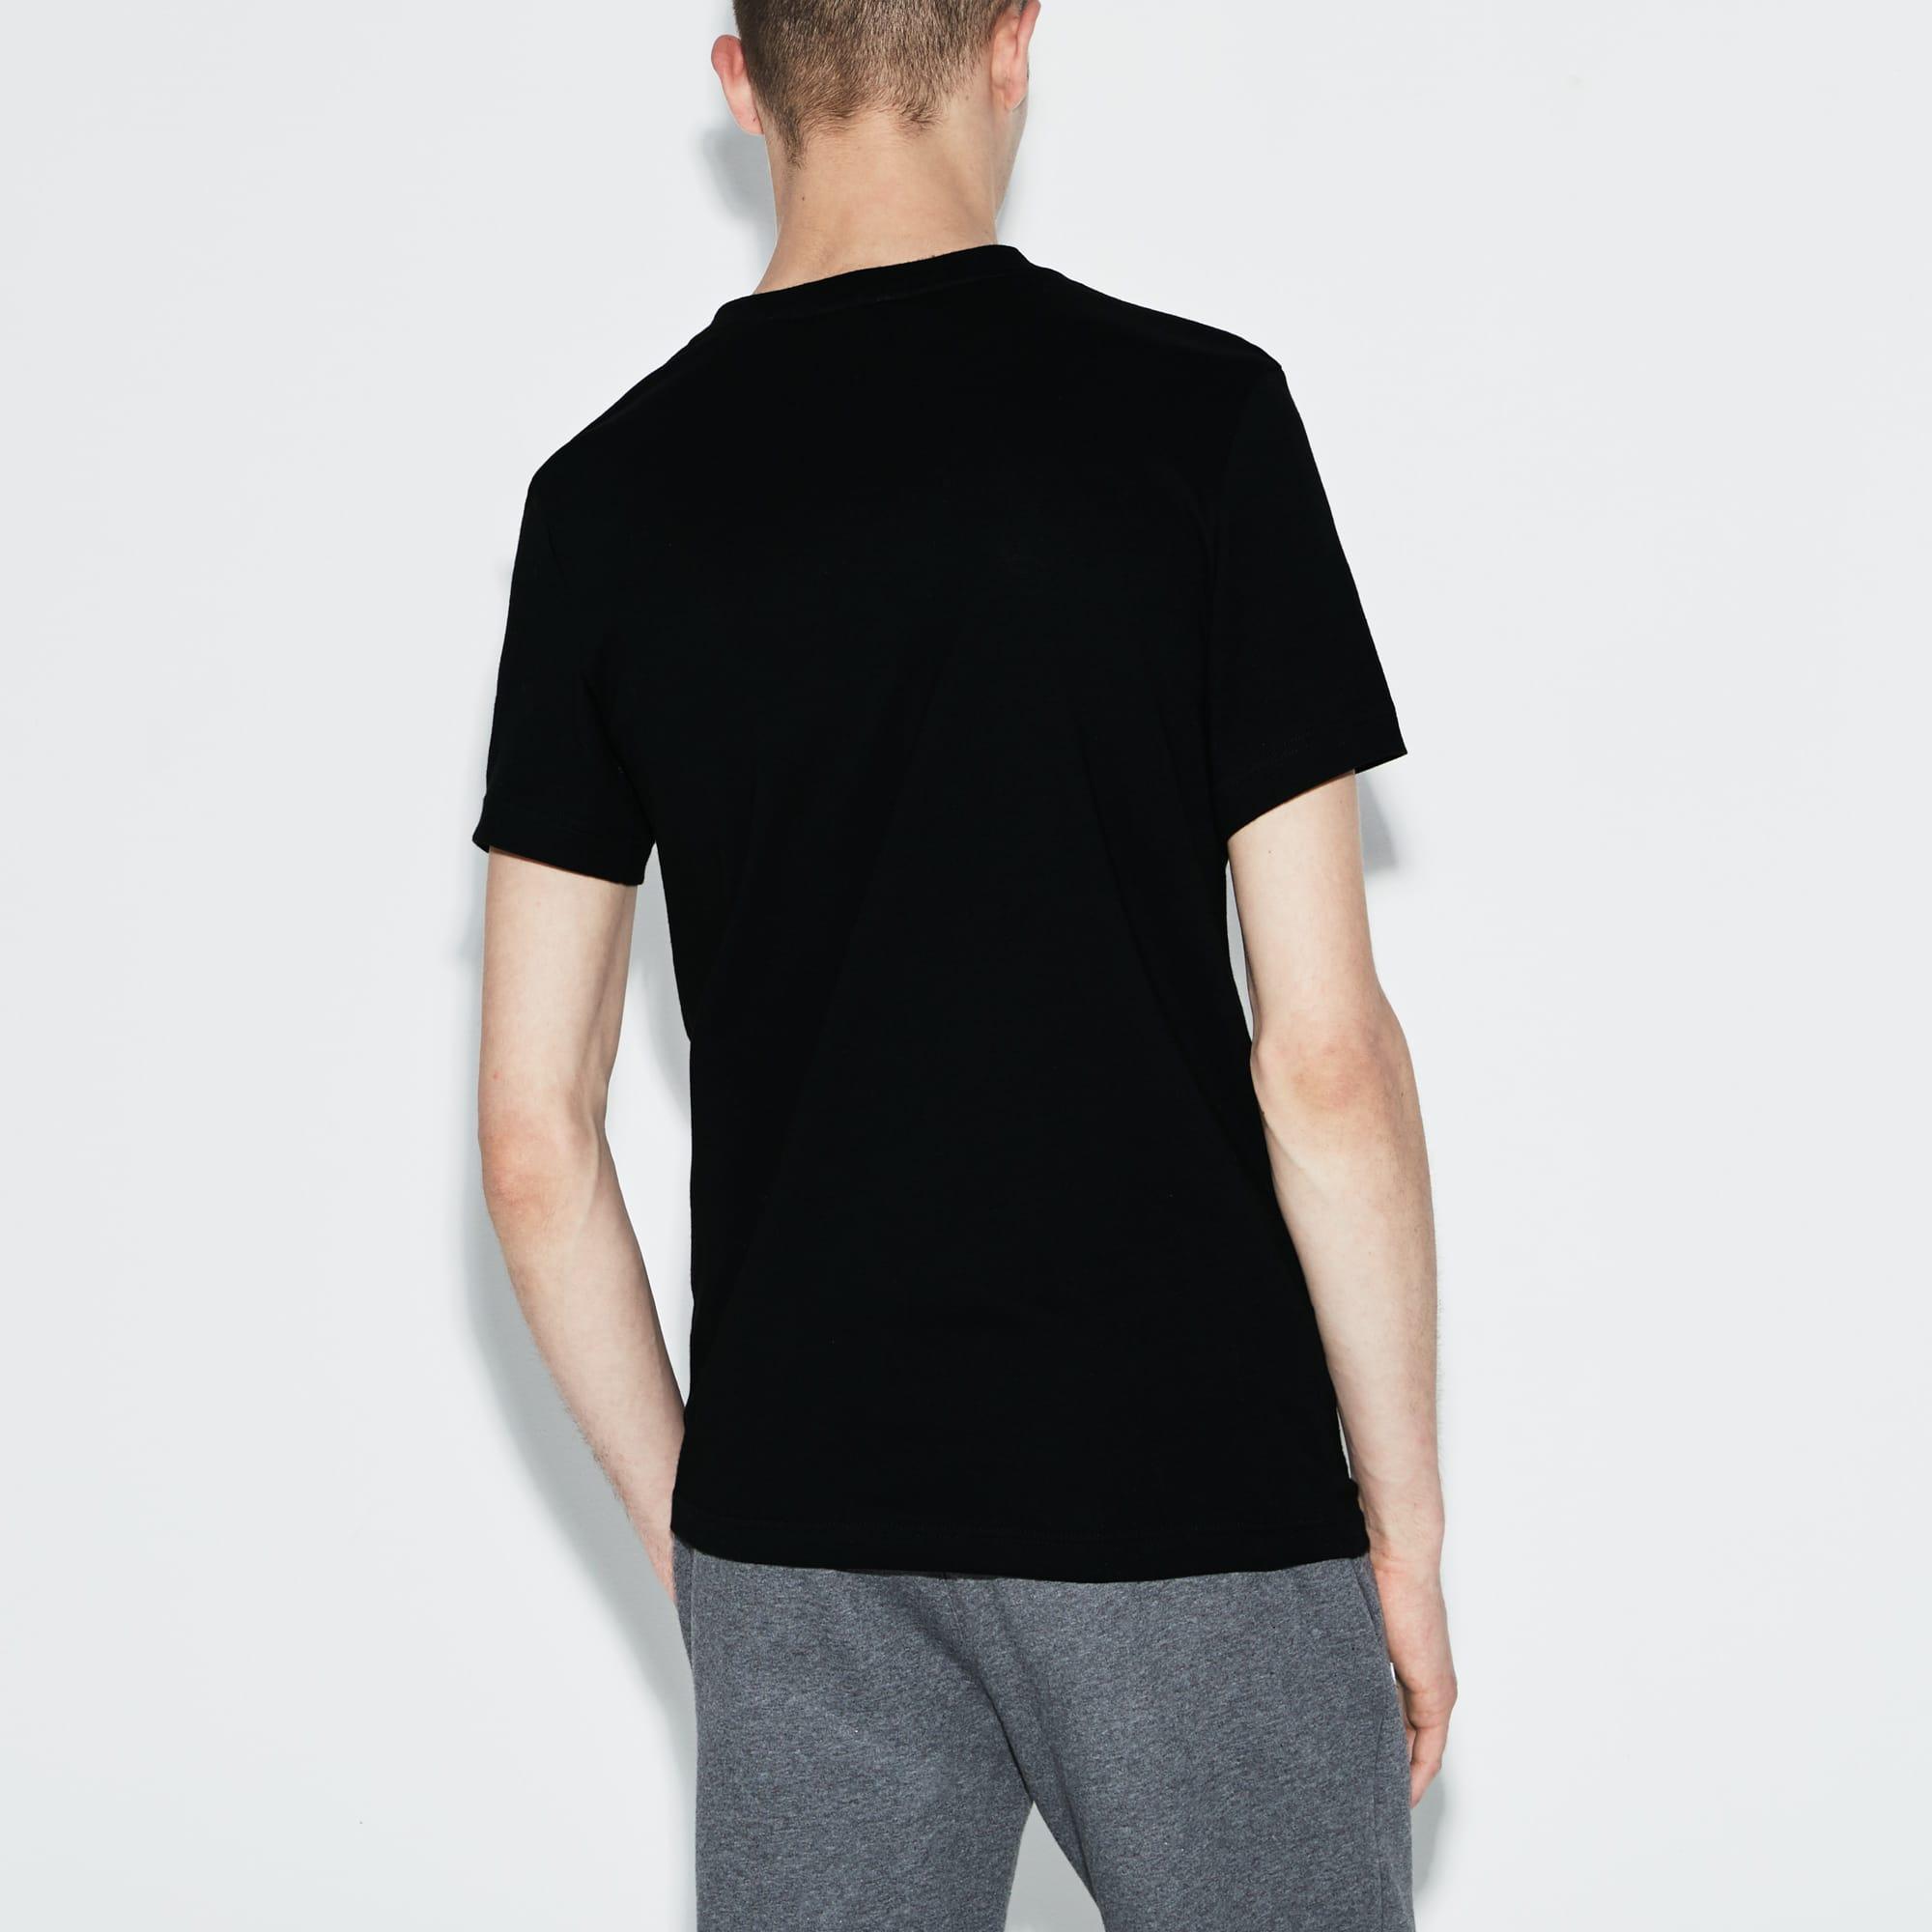 Lacoste SPORT男士圆领字母平纹单面针织网球T恤